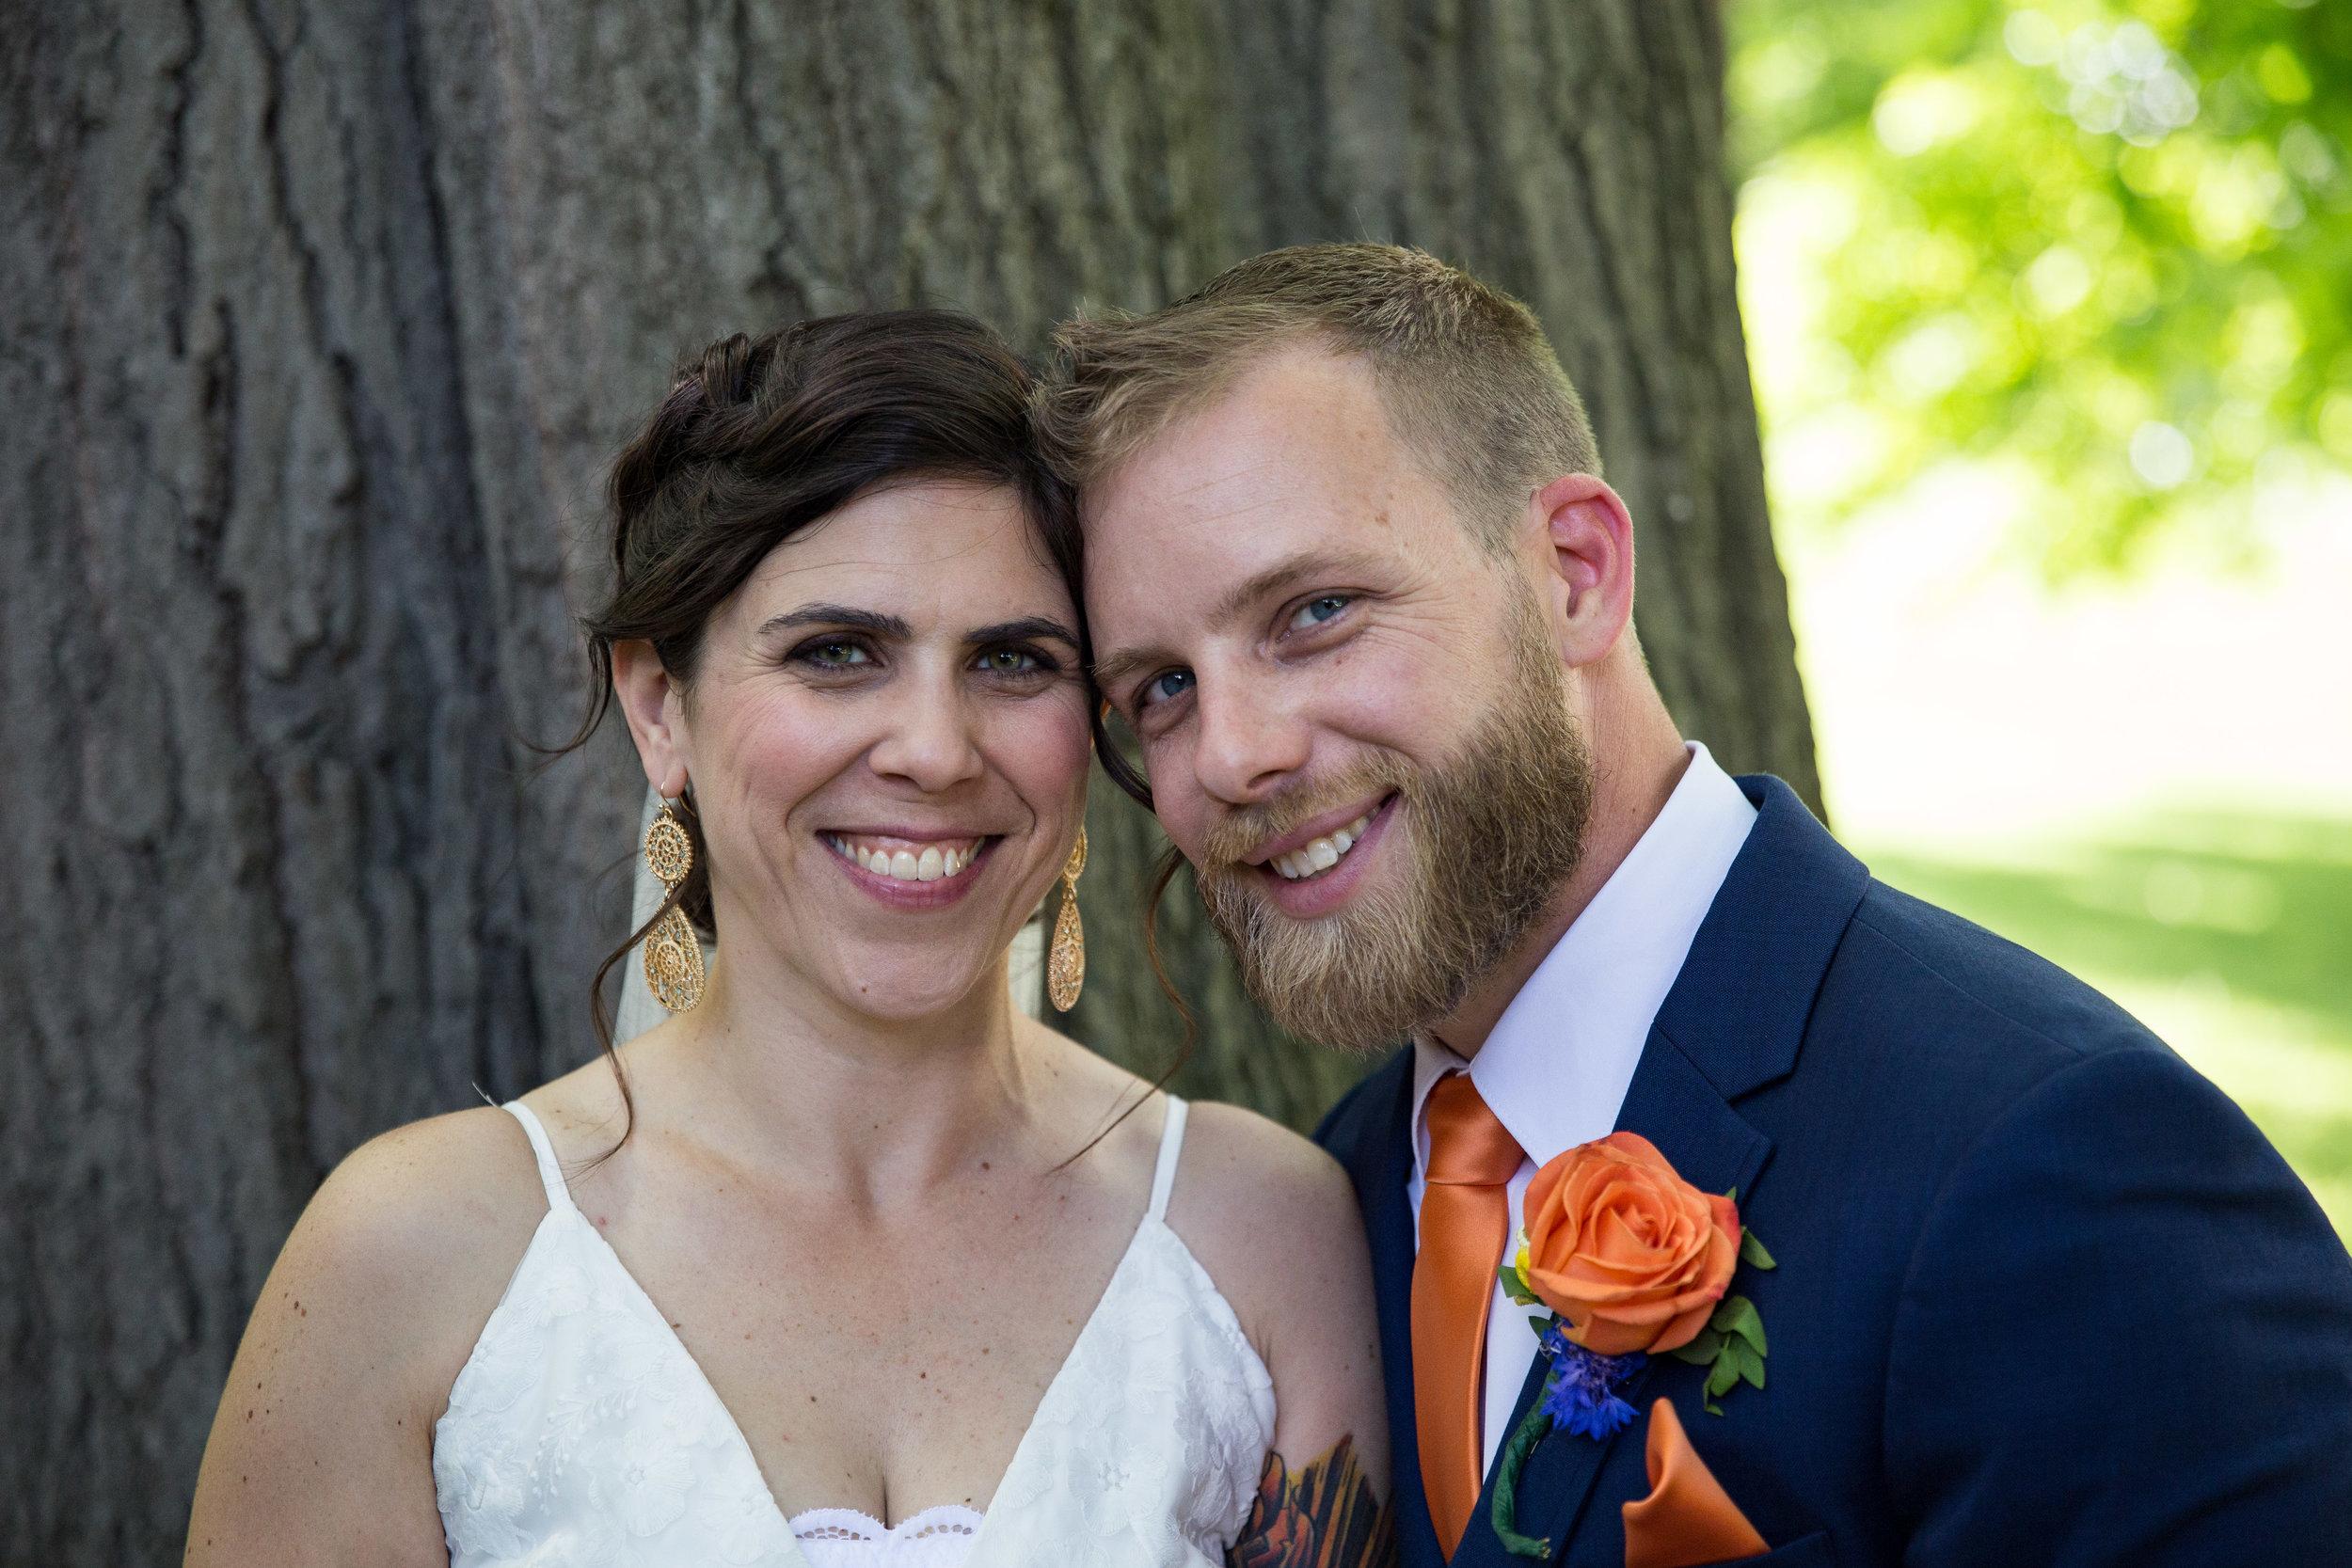 Natalie and Dallas Mooney Wedding 6-8-19_Tania Watt Photography-387.jpg